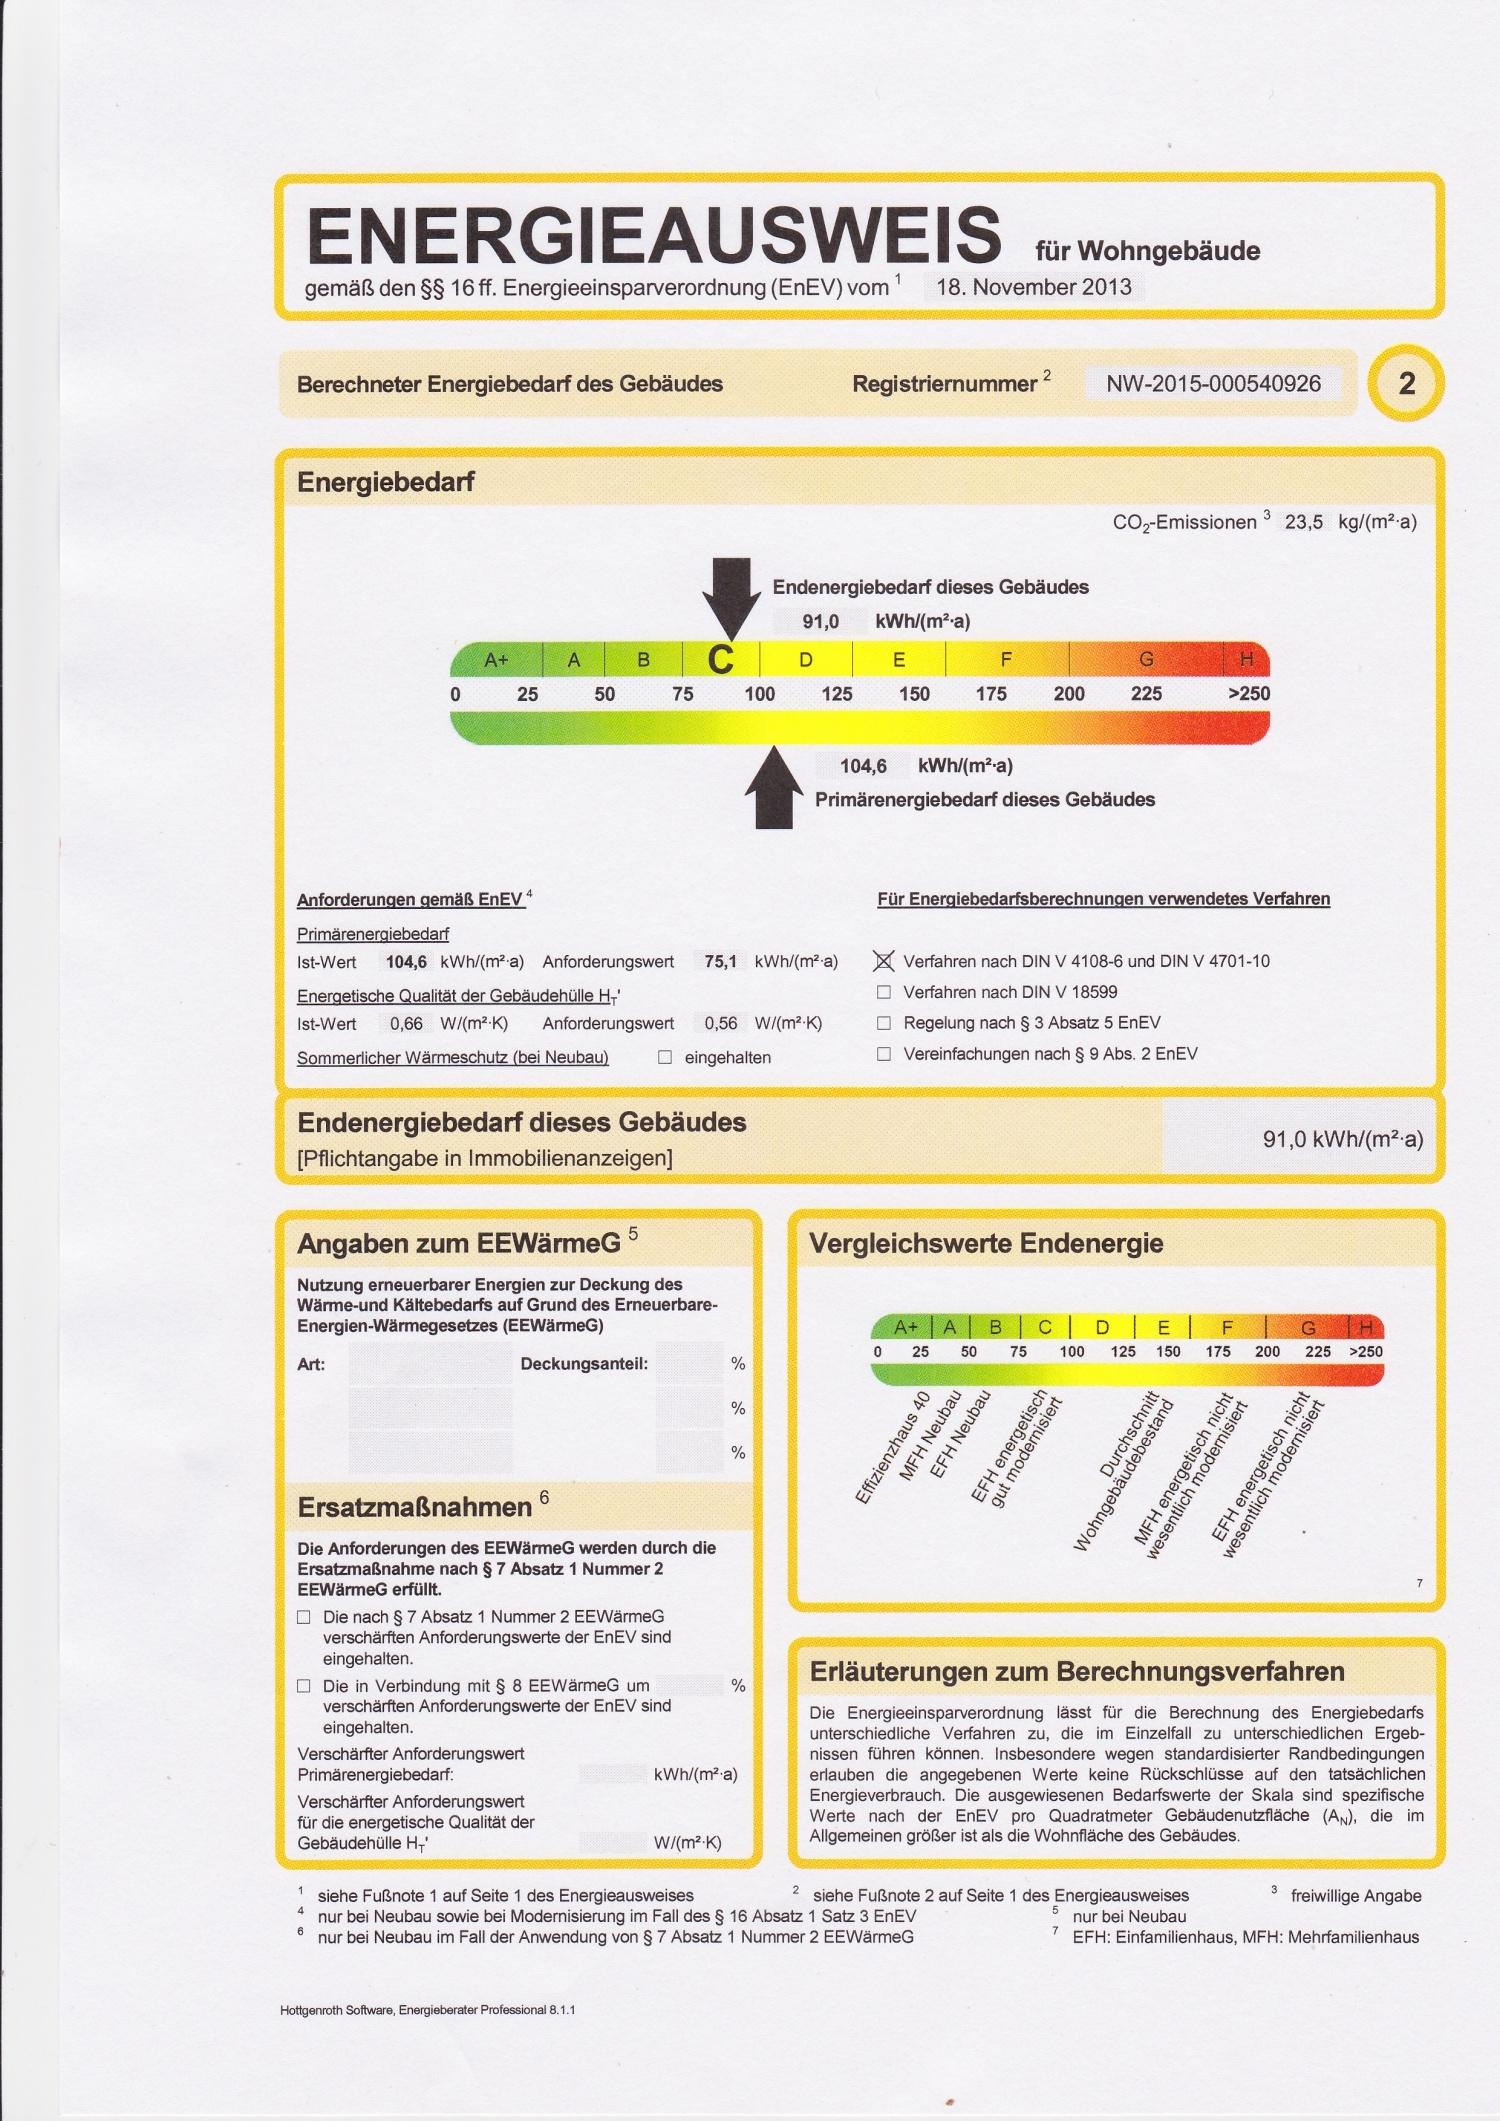 Energieausweis1